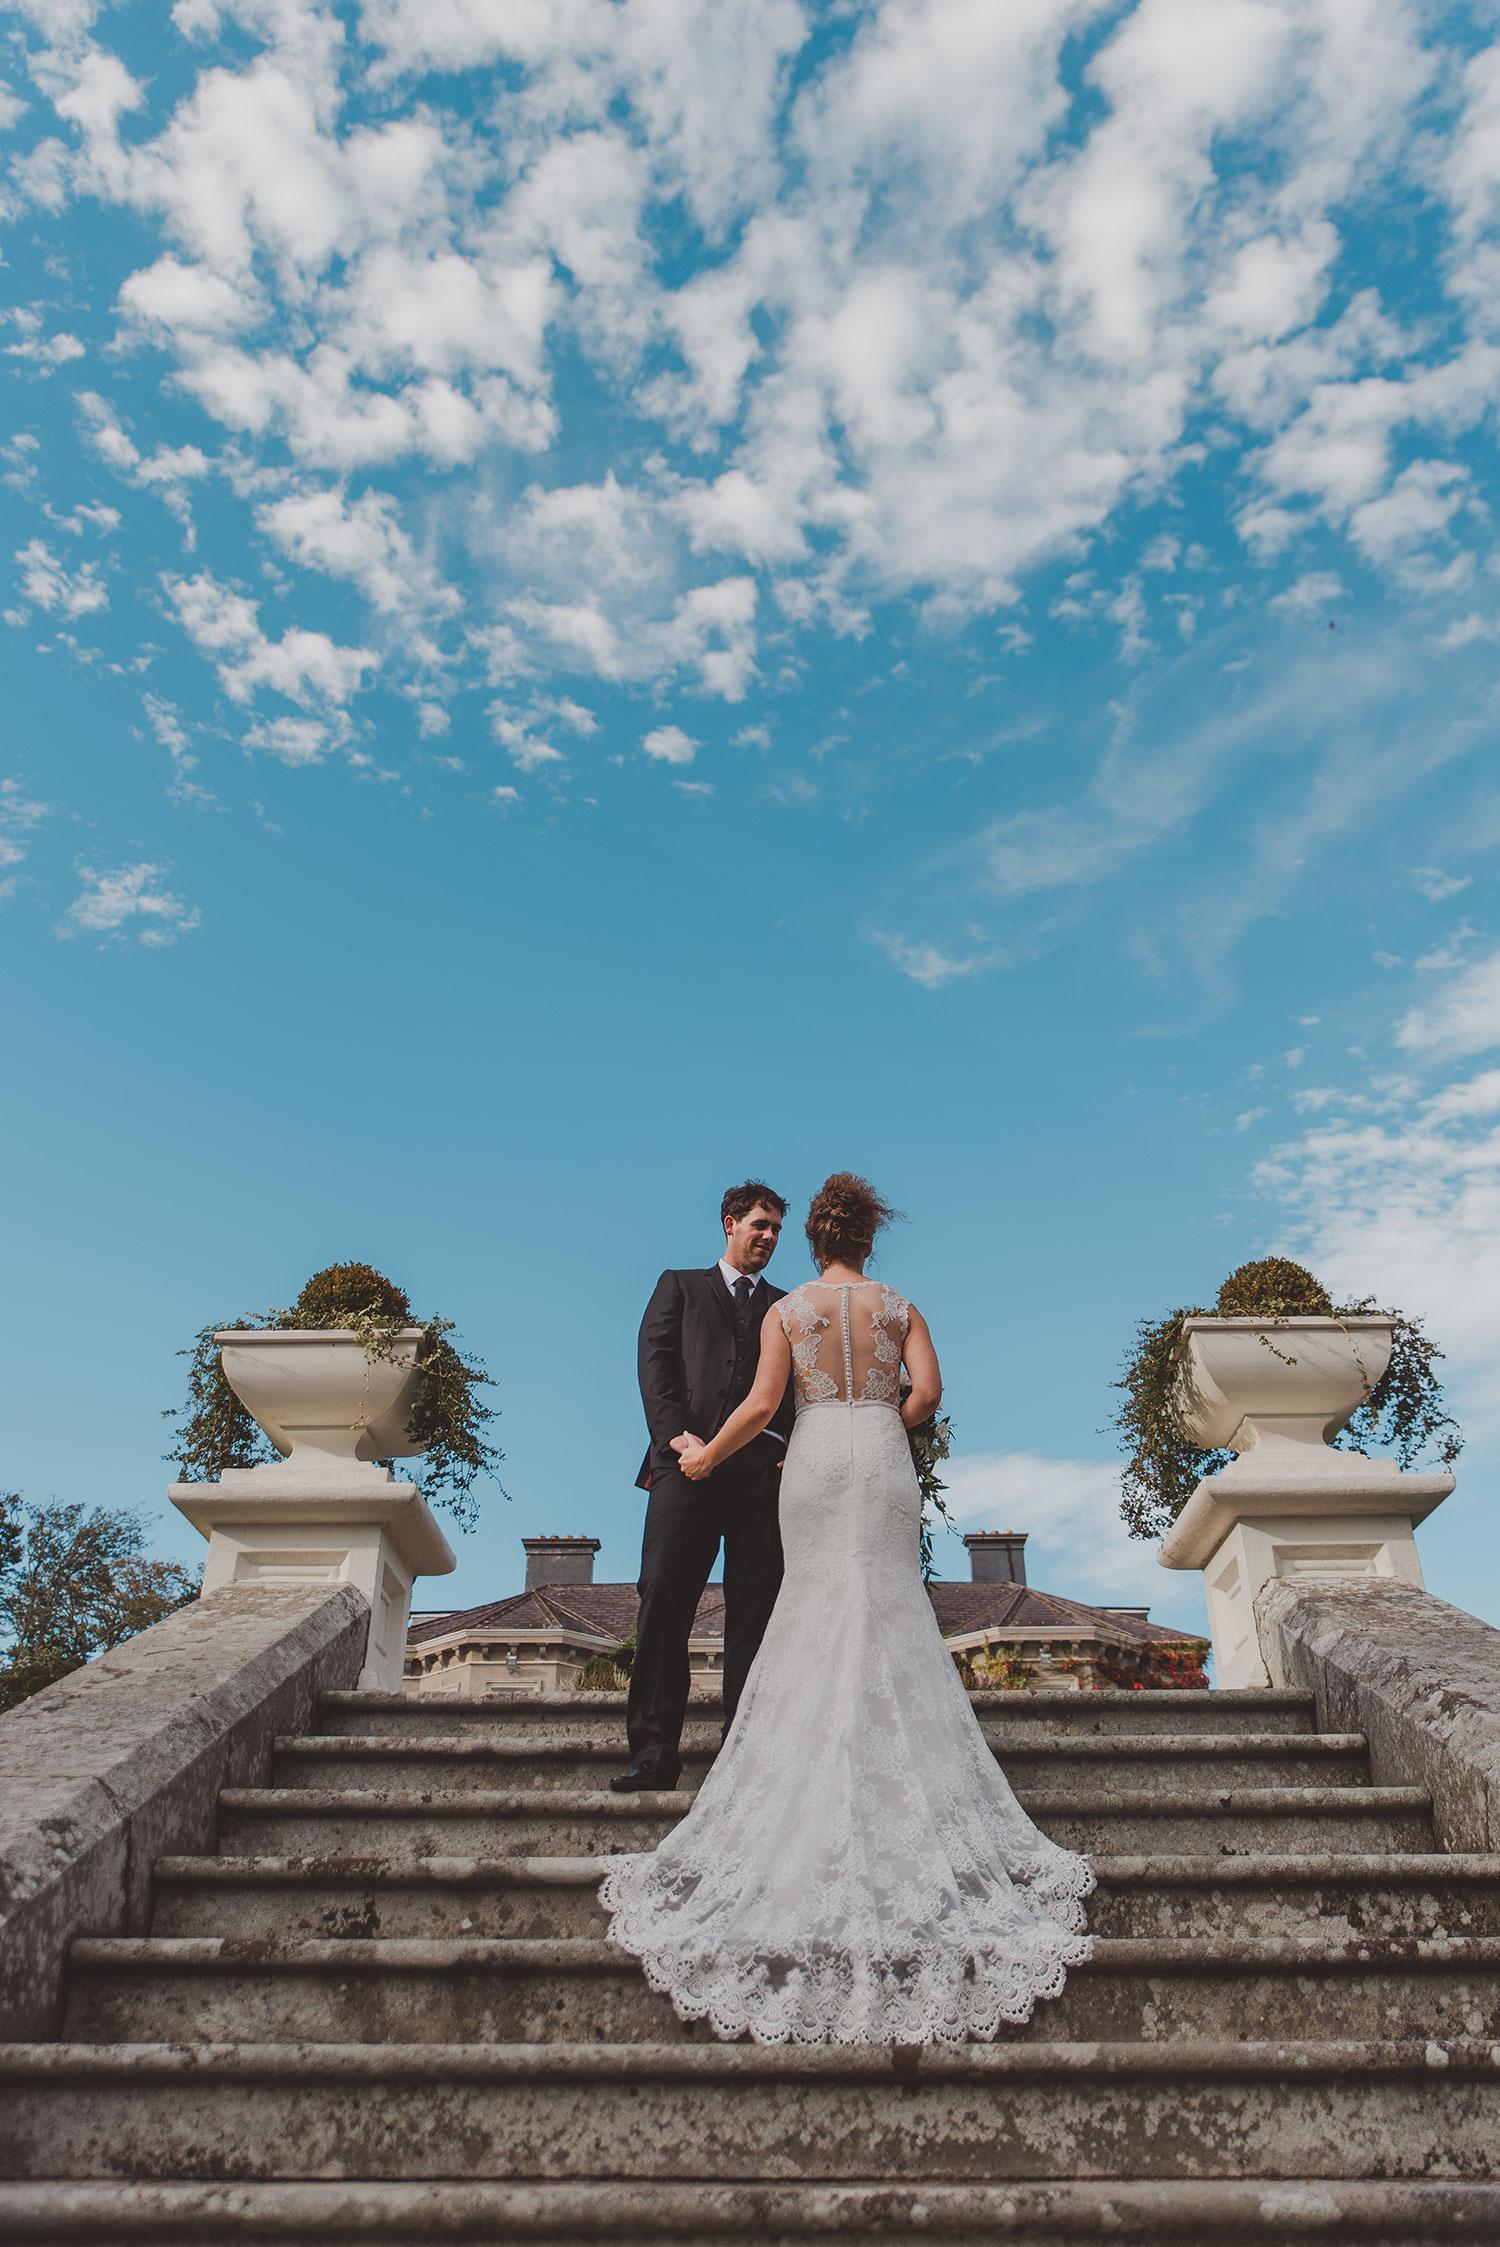 tinakilly-house-wedding-photographer095.jpg